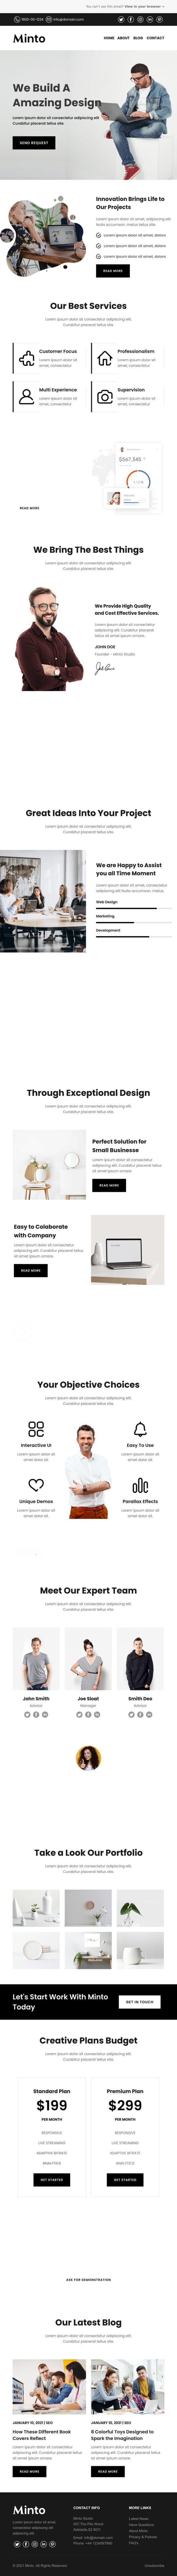 Minto Agency